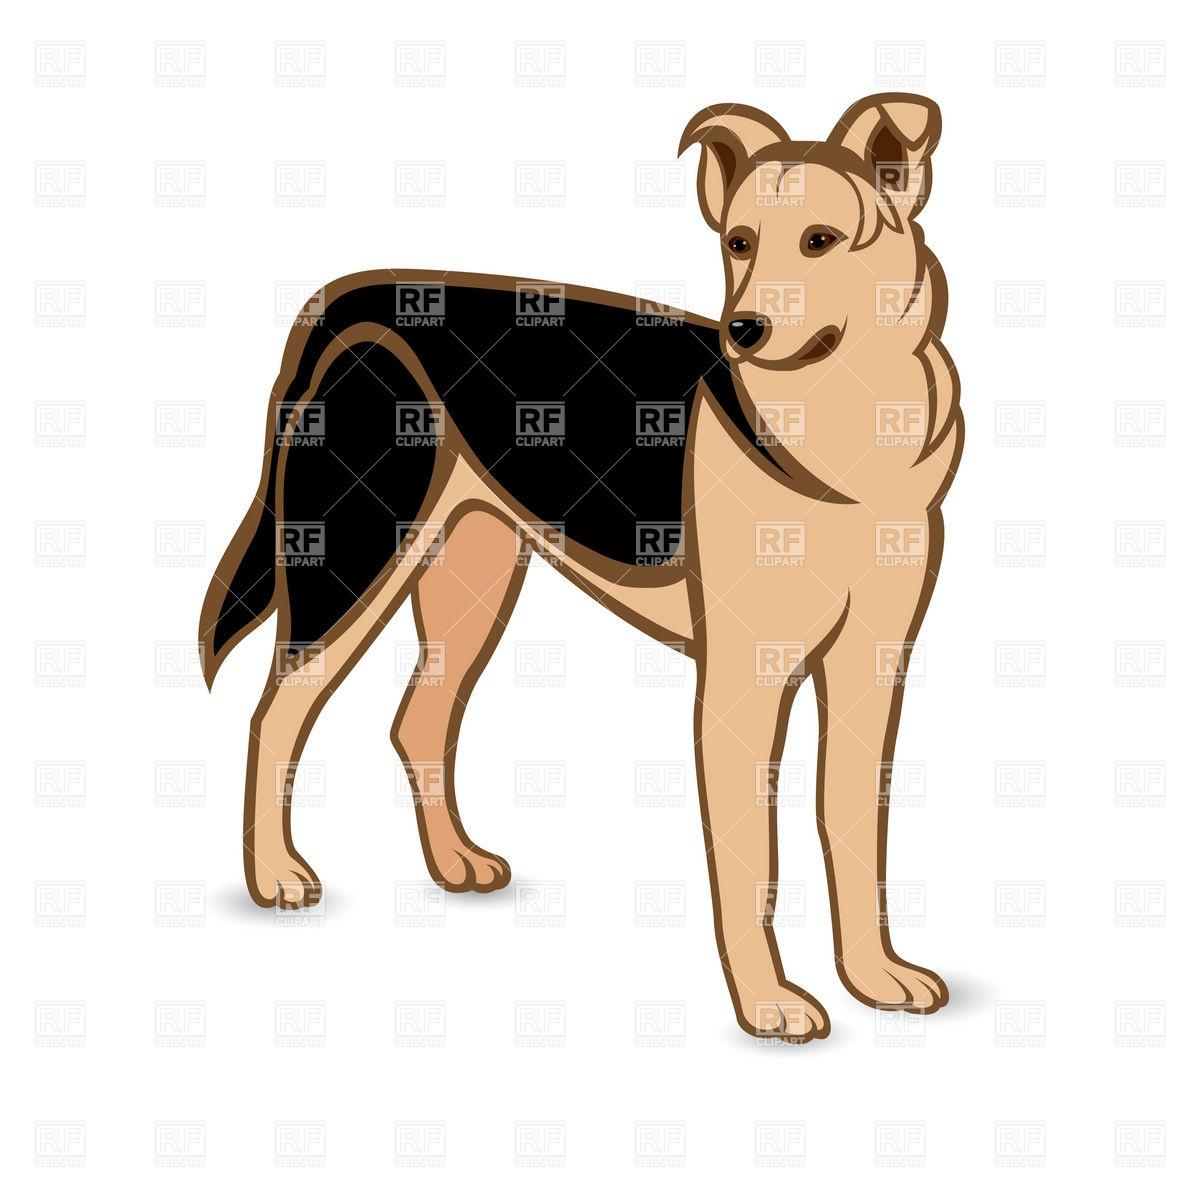 1200x1200 Dogs Rough Collie, Papillon, German Shepherd And English Bulldog